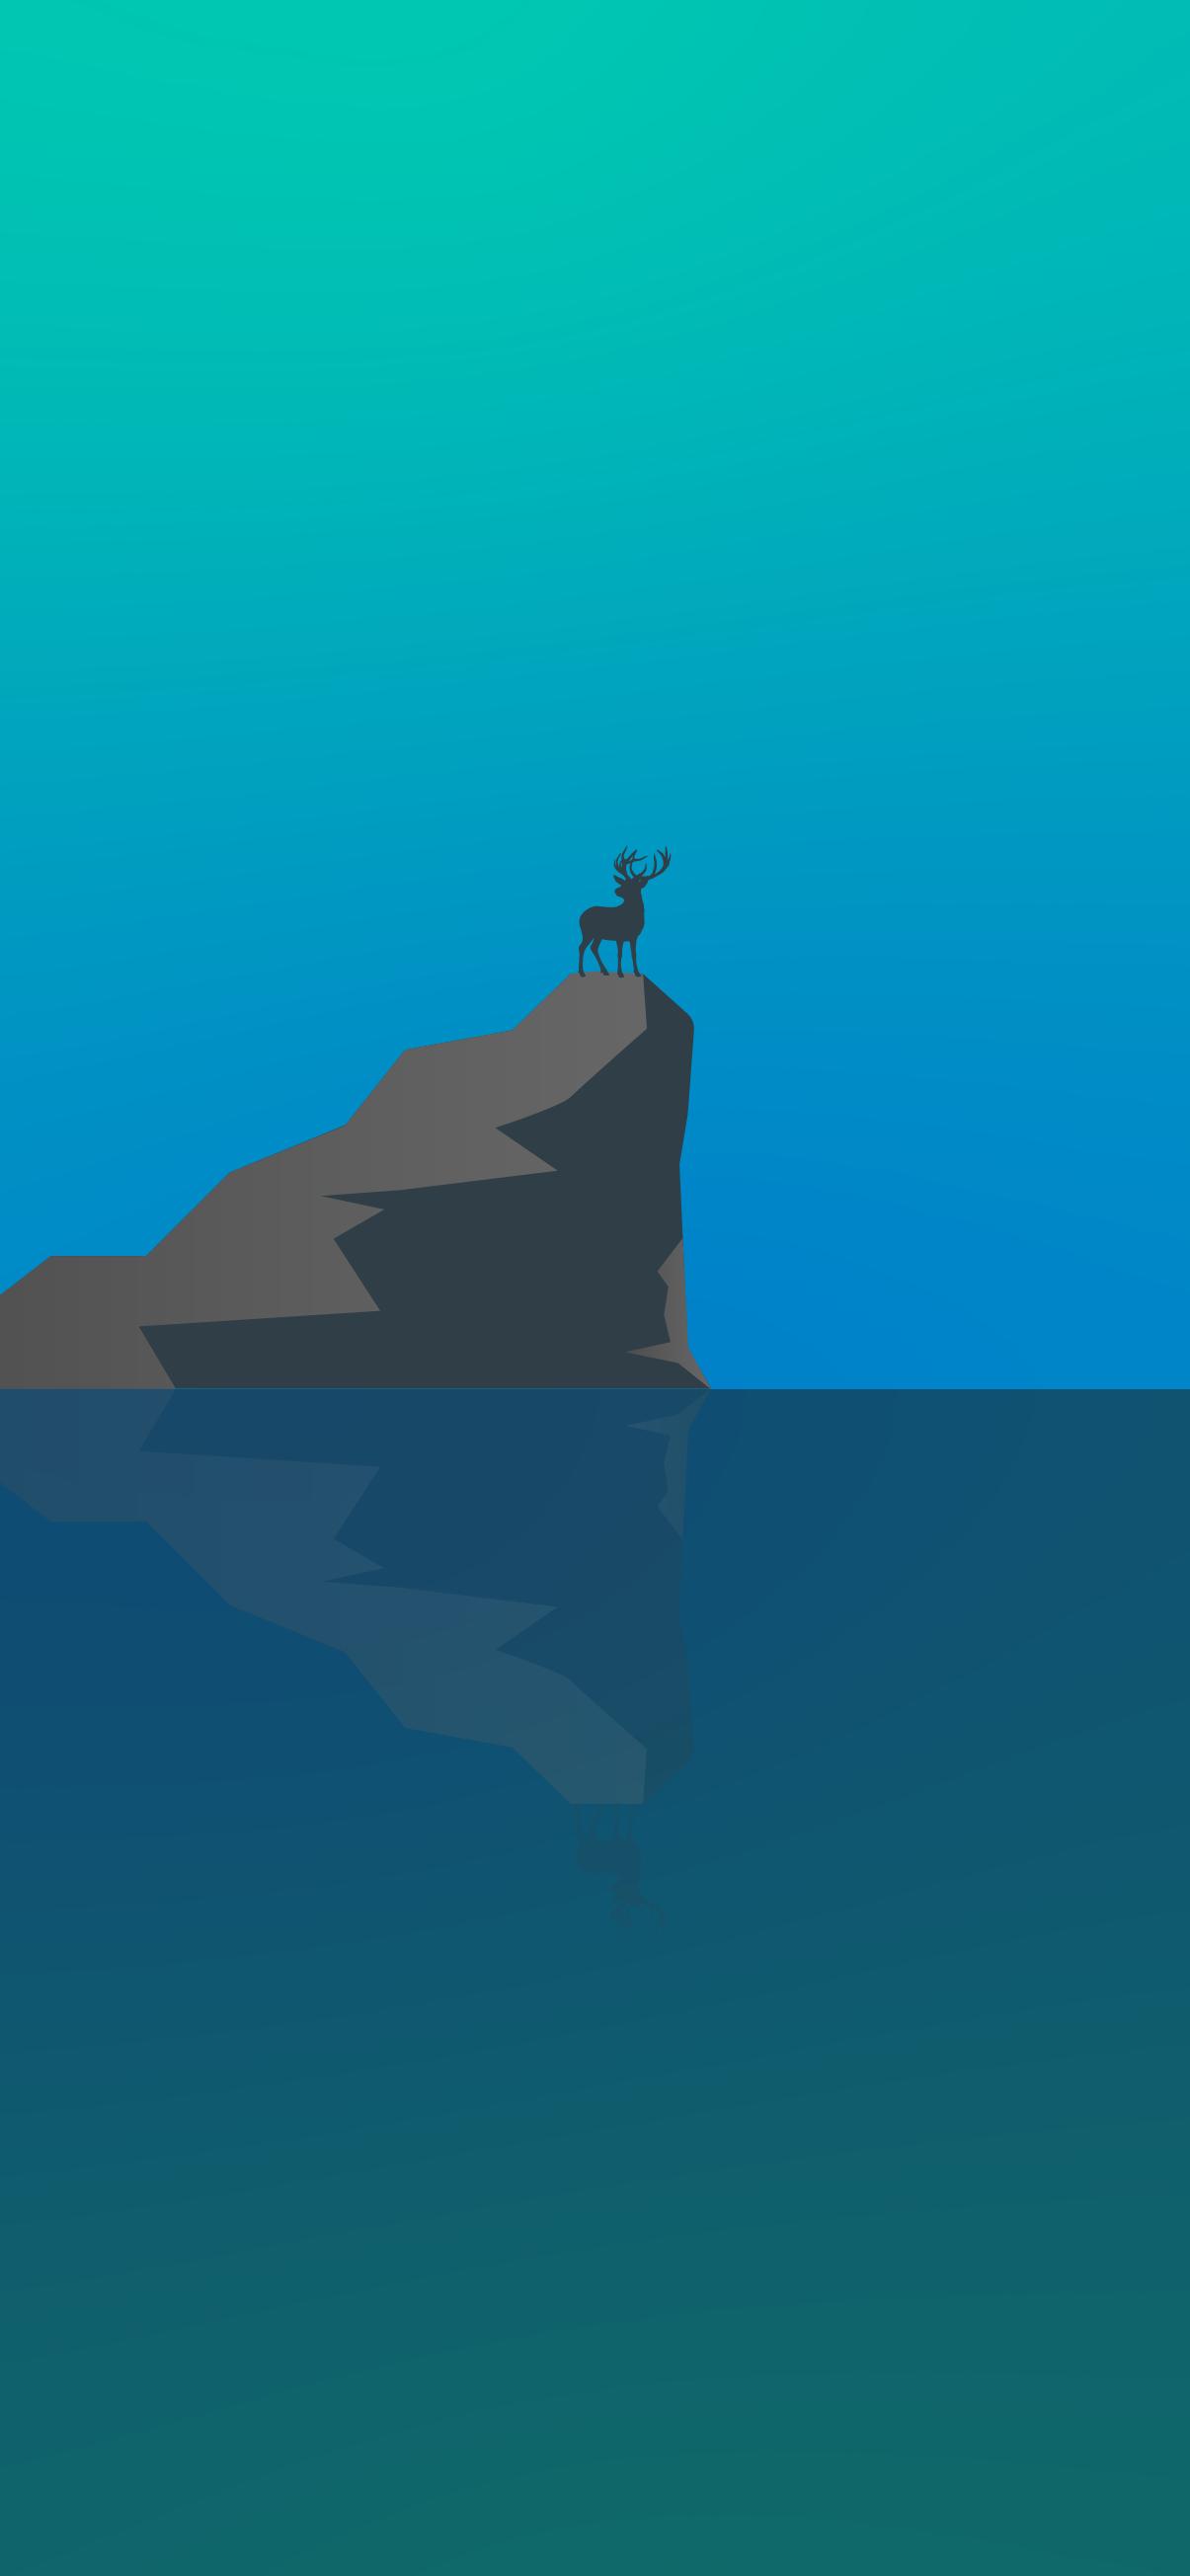 iphone-wallpaper-hd-4k-minimal-landscape-blue